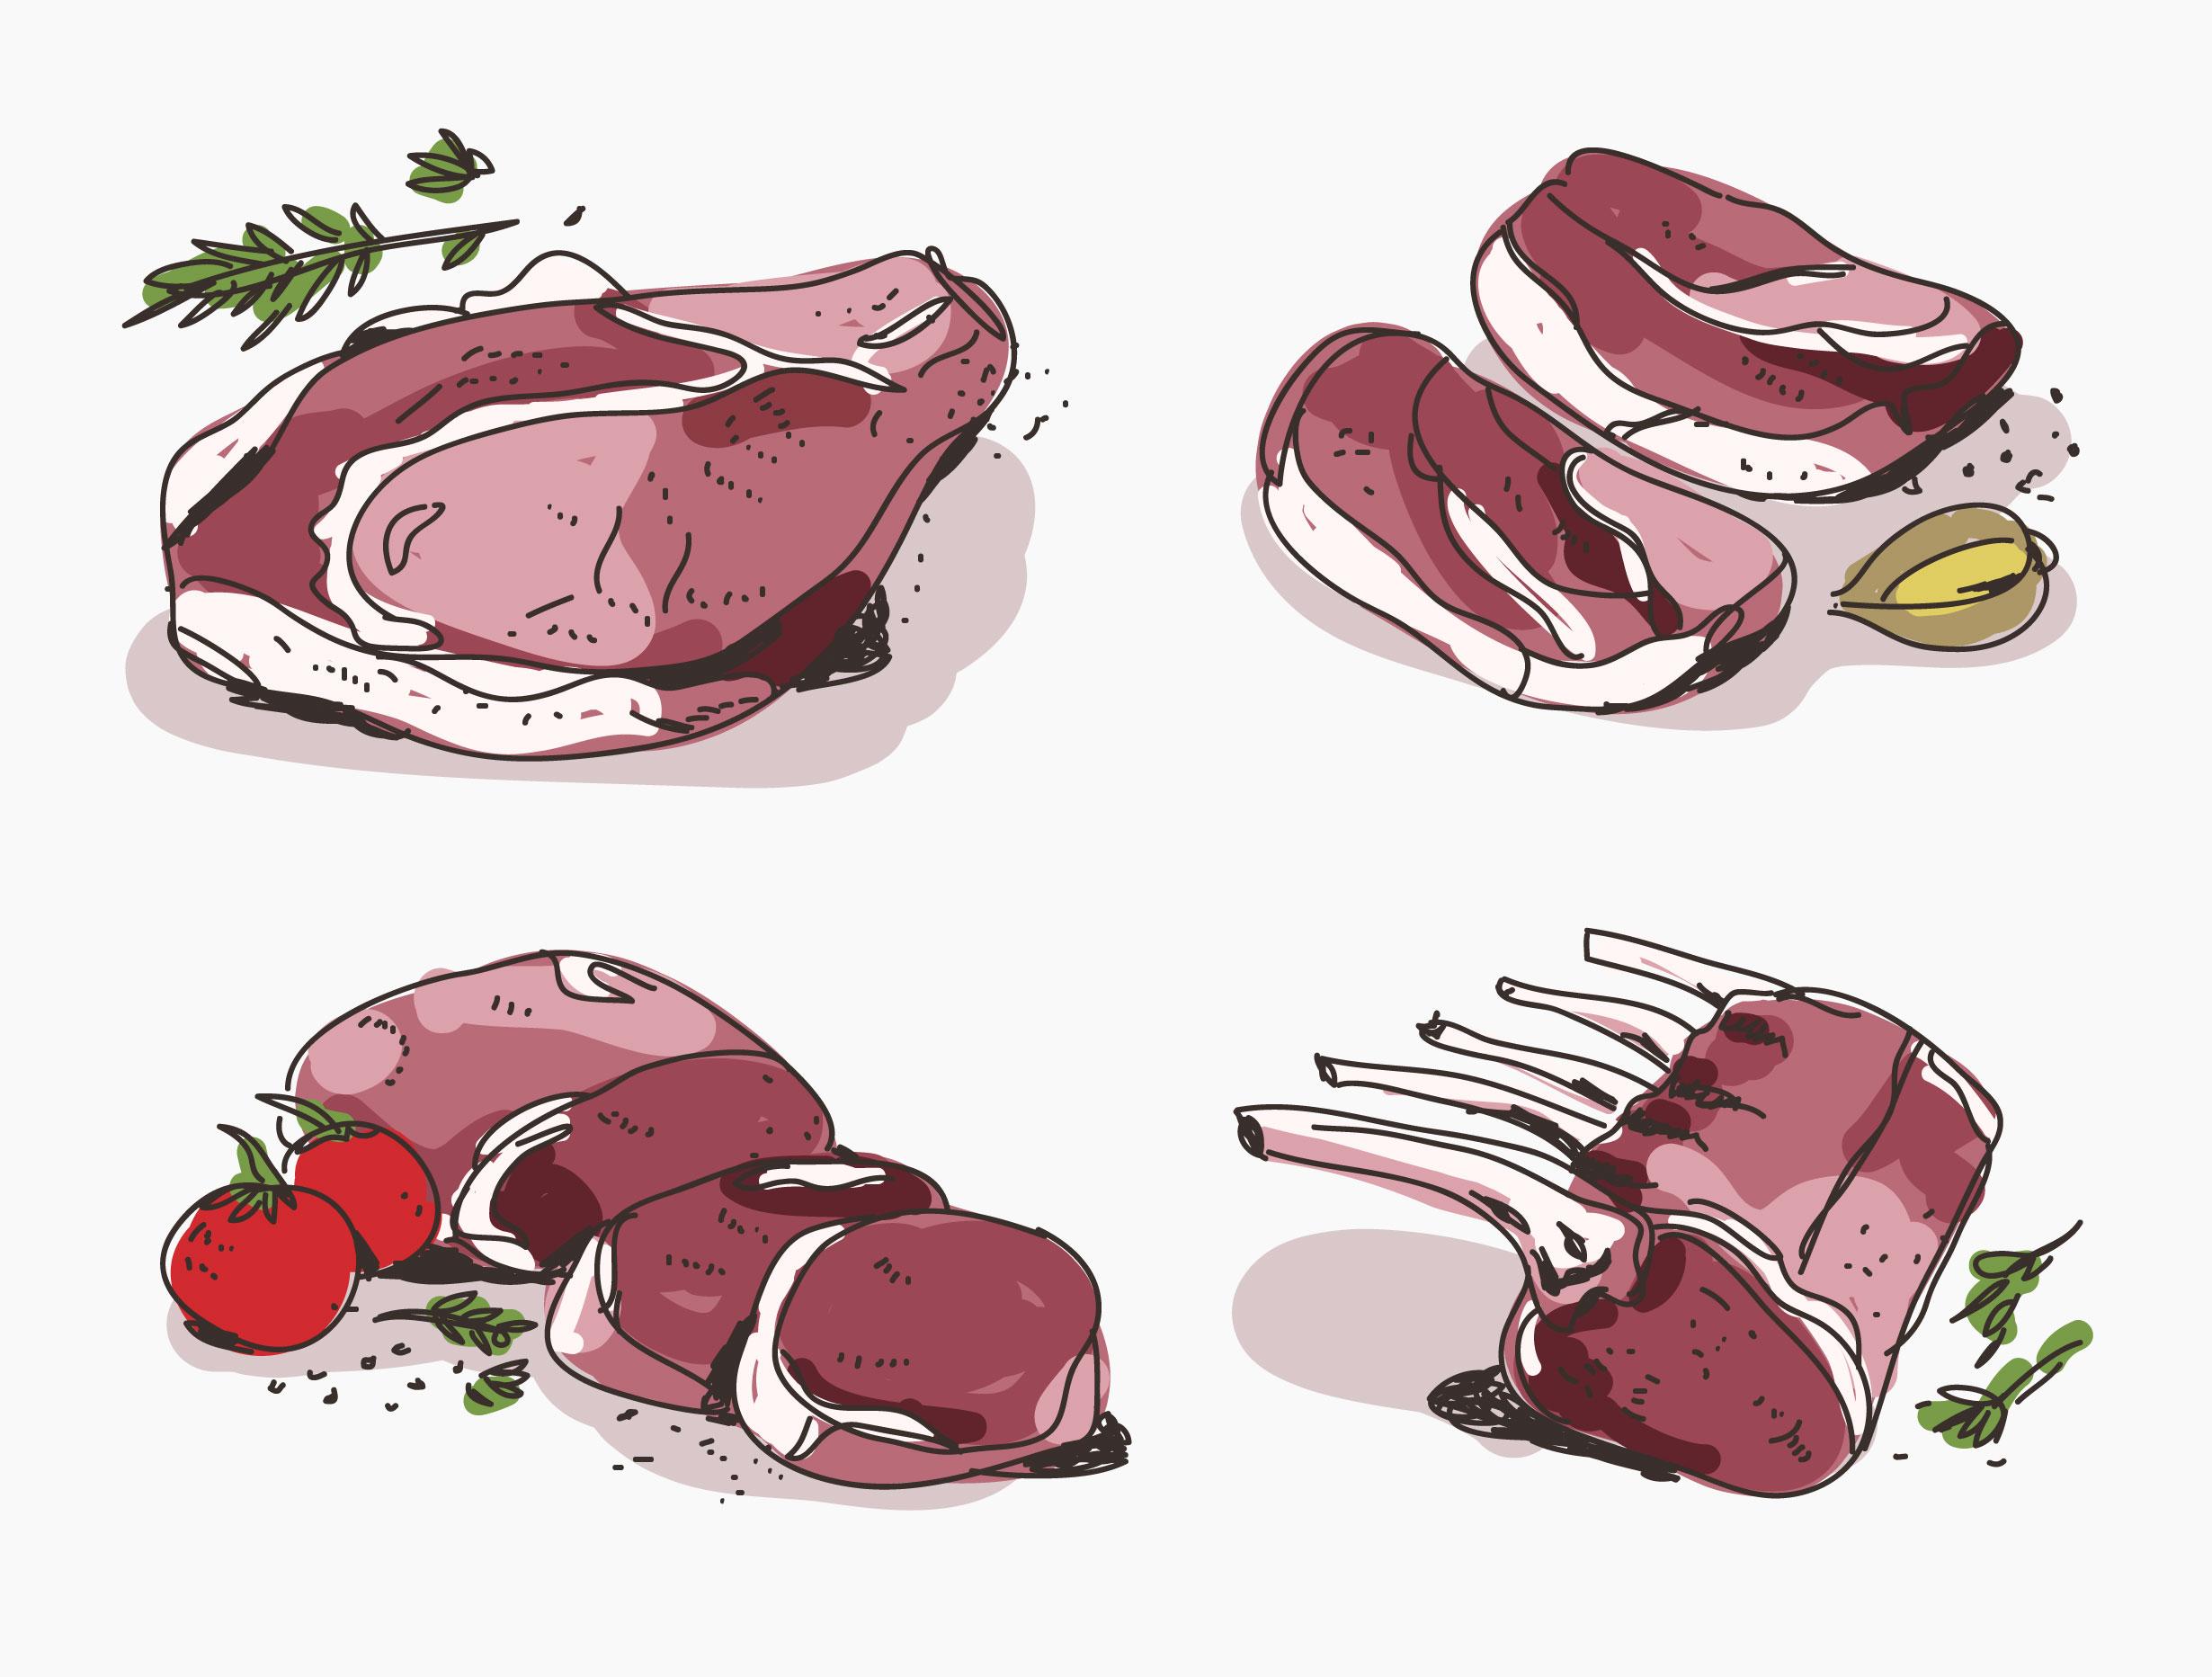 how to grill rack of lamb chops lammkotelett grillen von der marinade auf den grill rack of. Black Bedroom Furniture Sets. Home Design Ideas